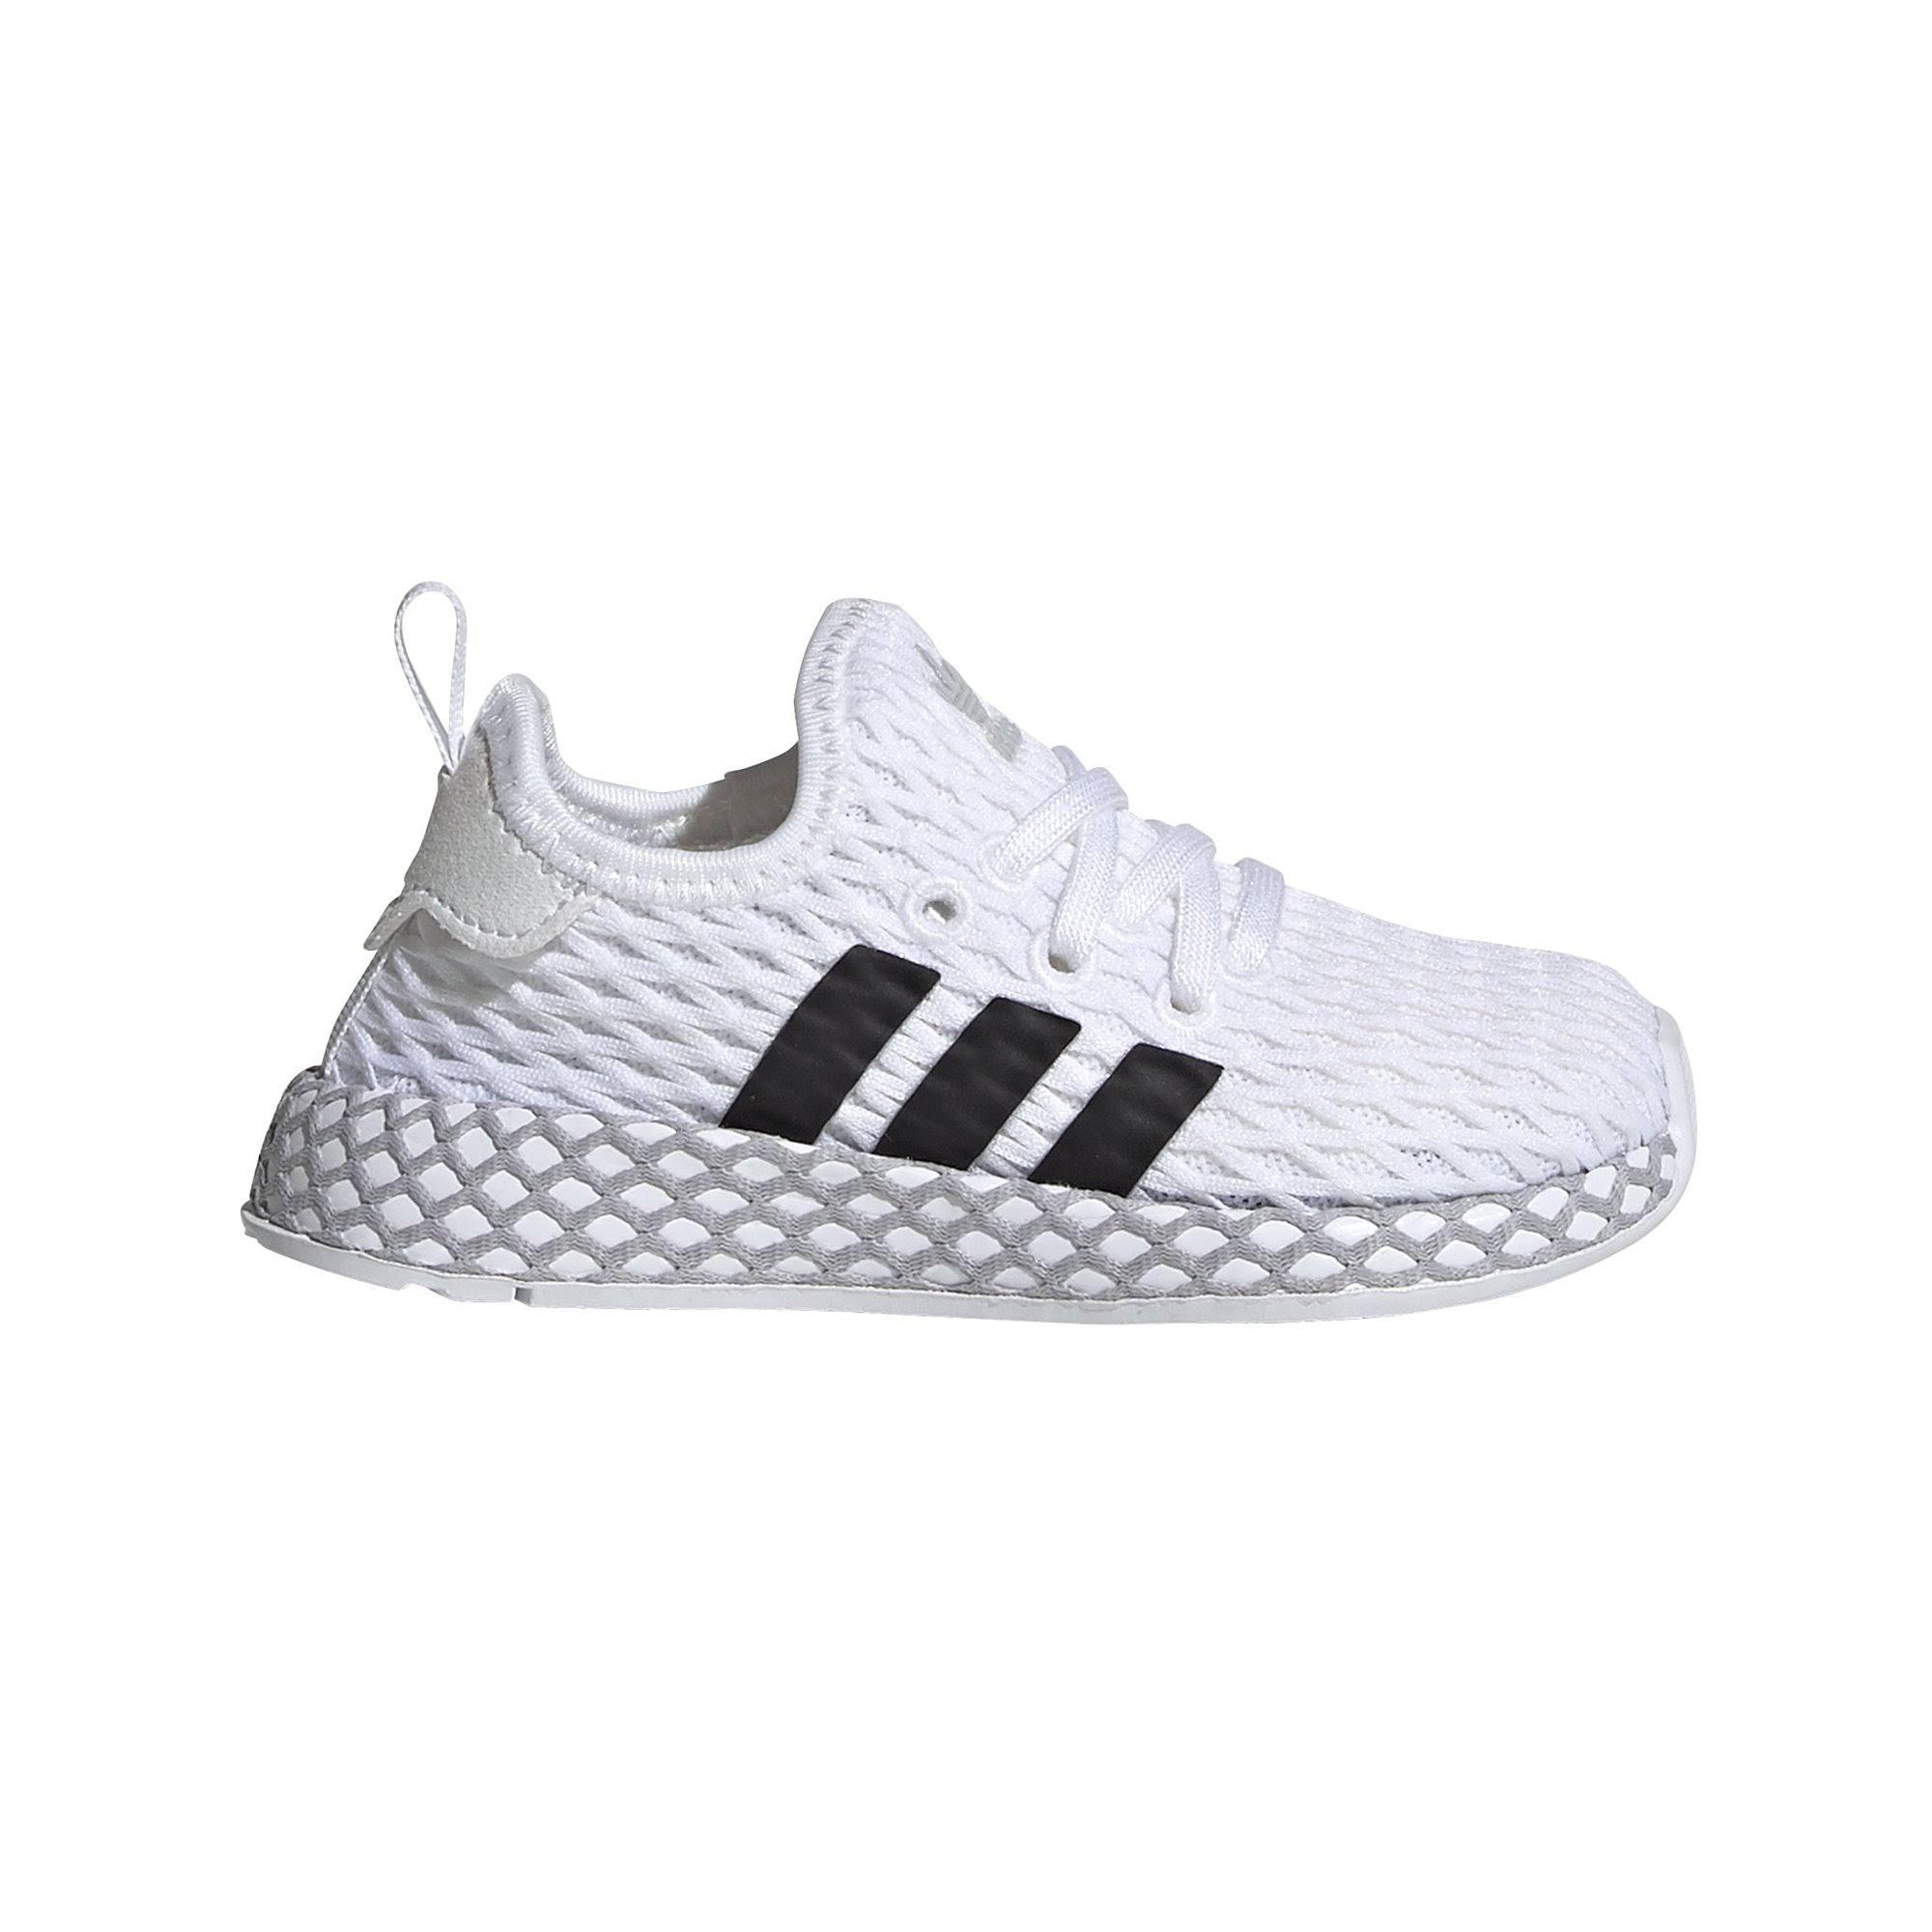 Adidas Originals Deerupt Infant - White - Trainers